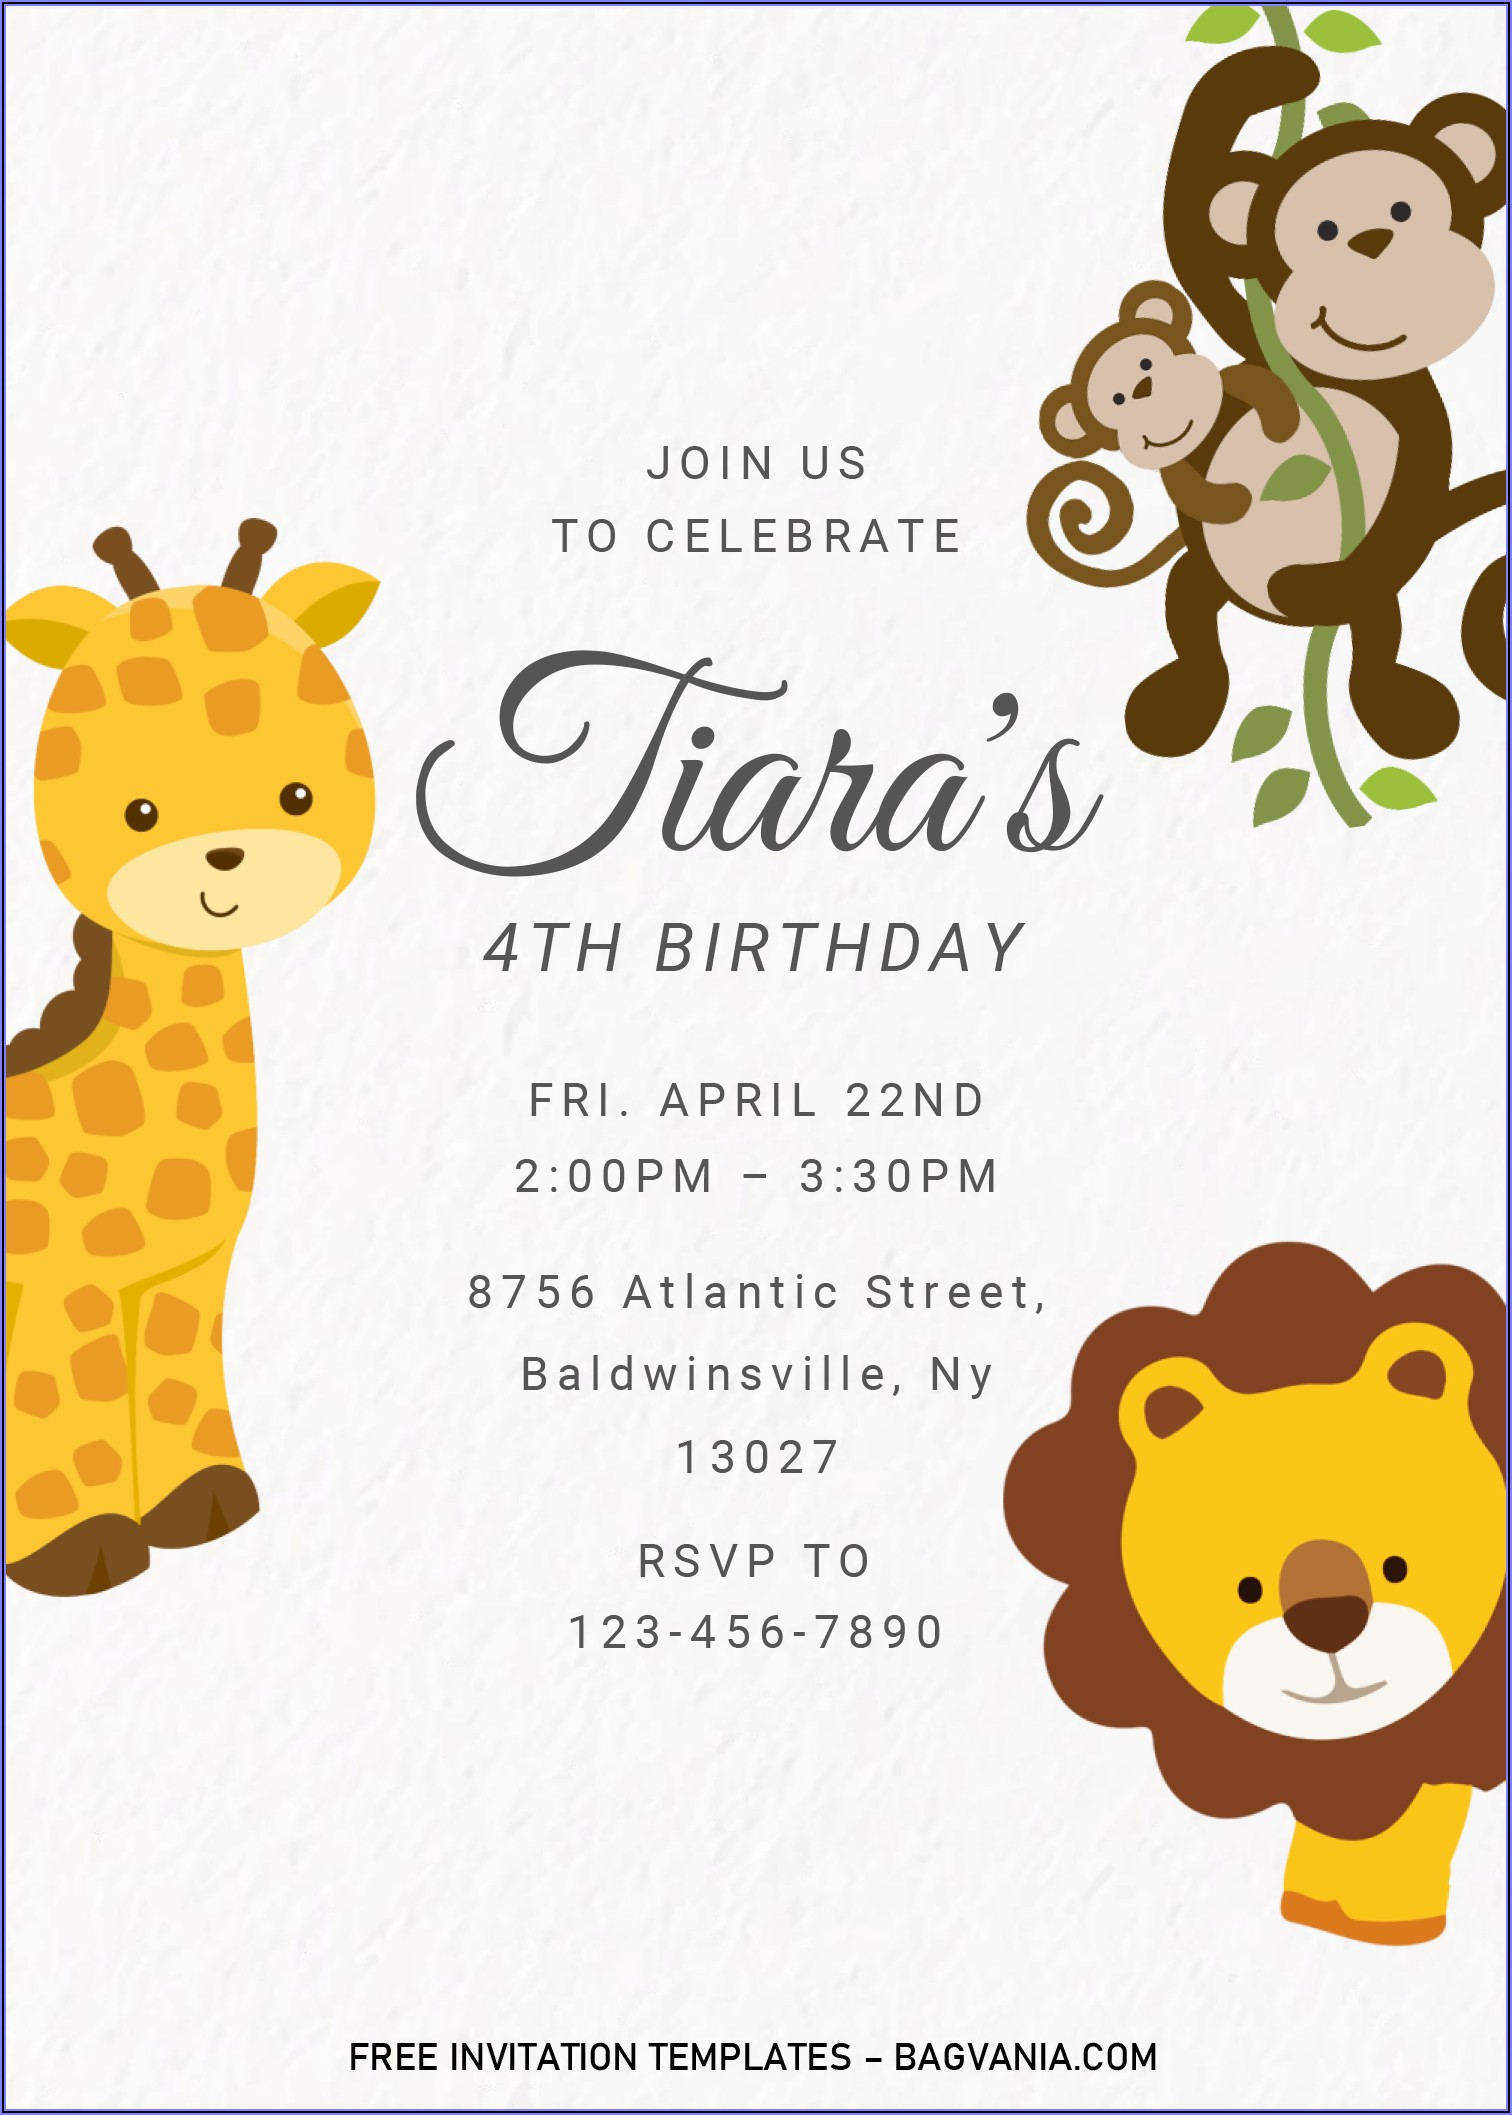 Editable Birthday Invitations Templates Free Word